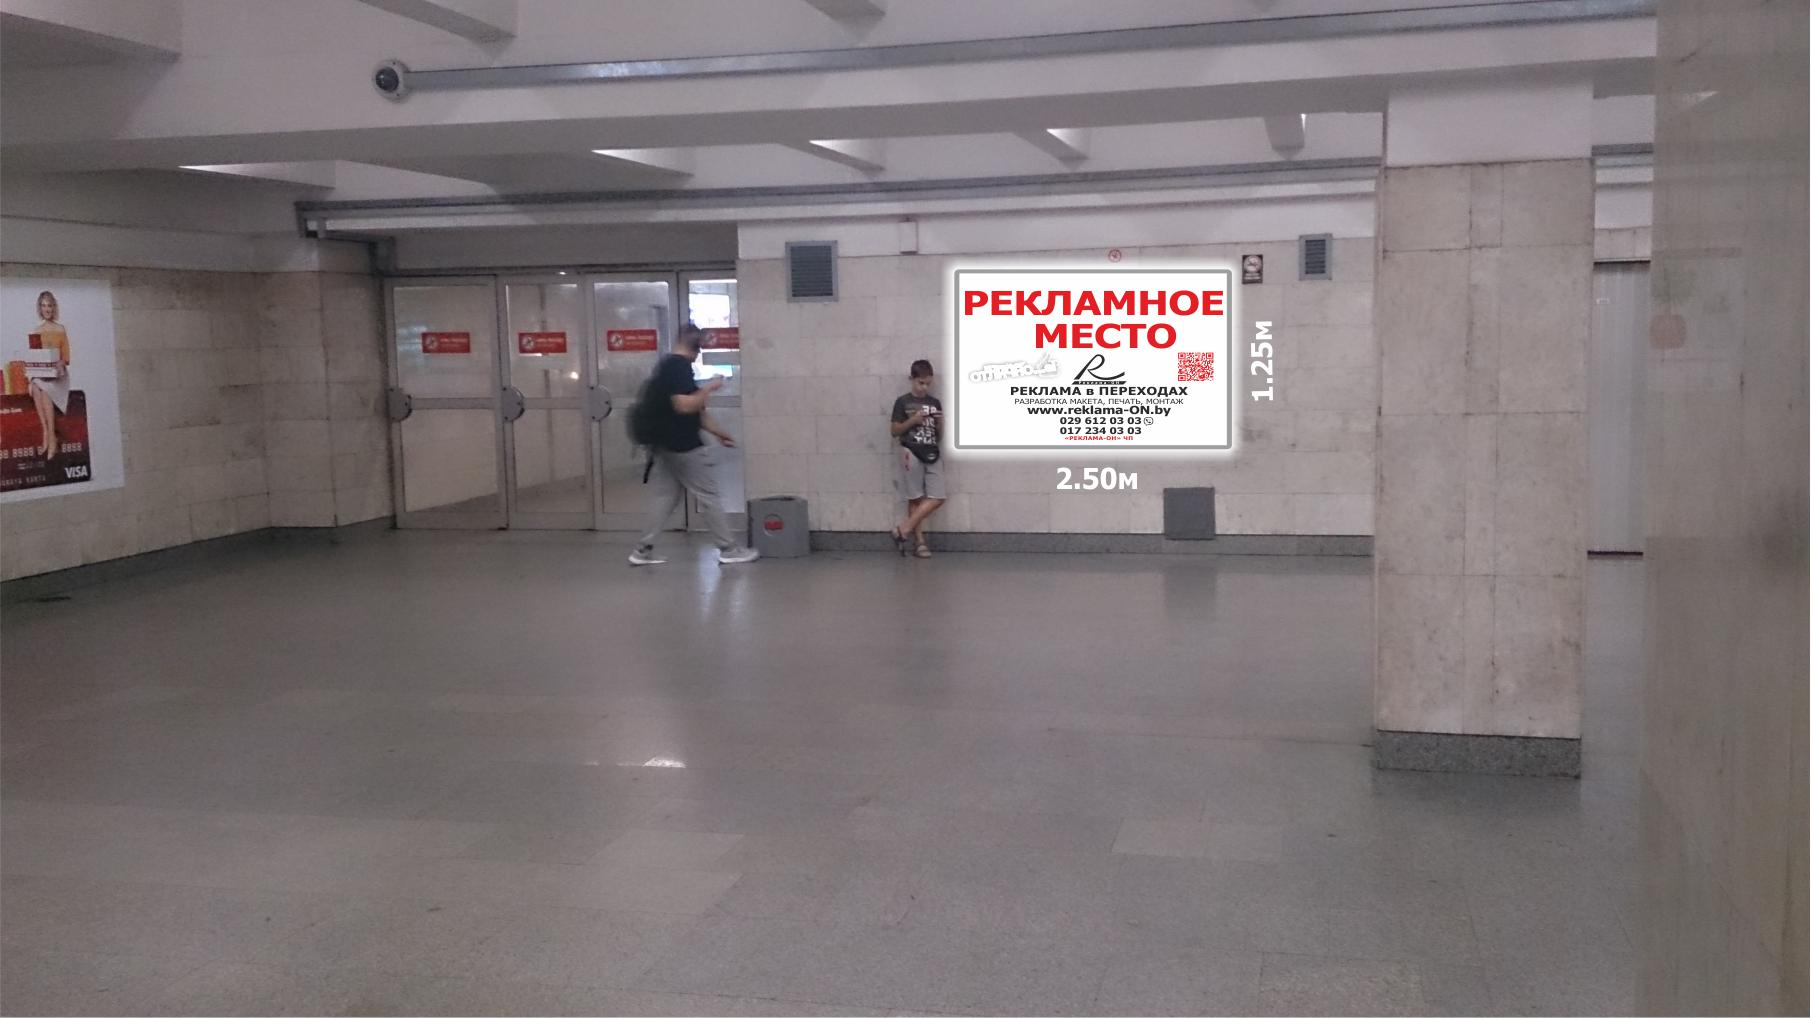 Ультраяркий световой лайтбокс на станции метро Партизанская (переход) reklama-on.by